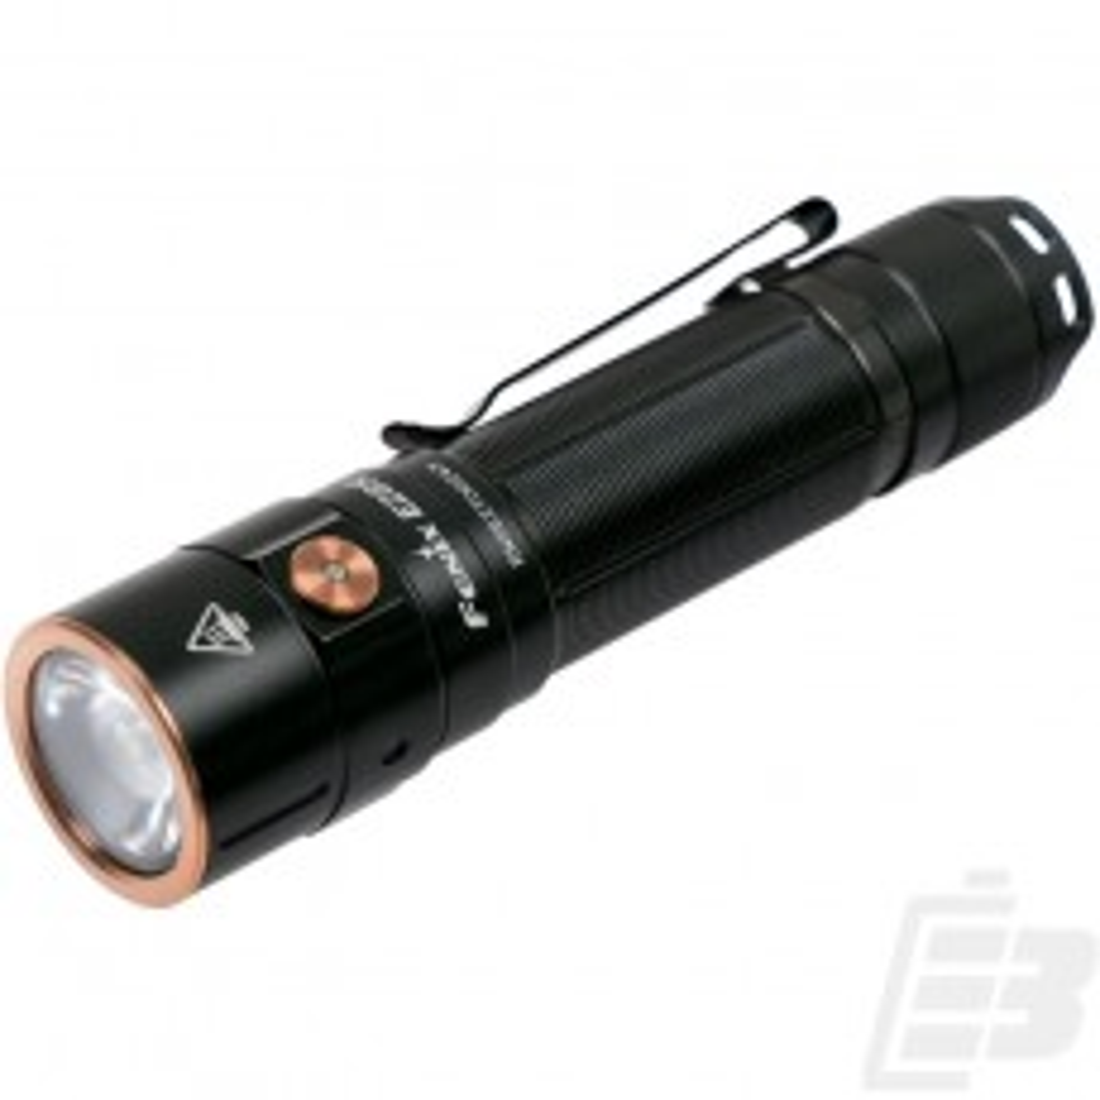 Fenix E28R Rechargeable EDC Flashlight